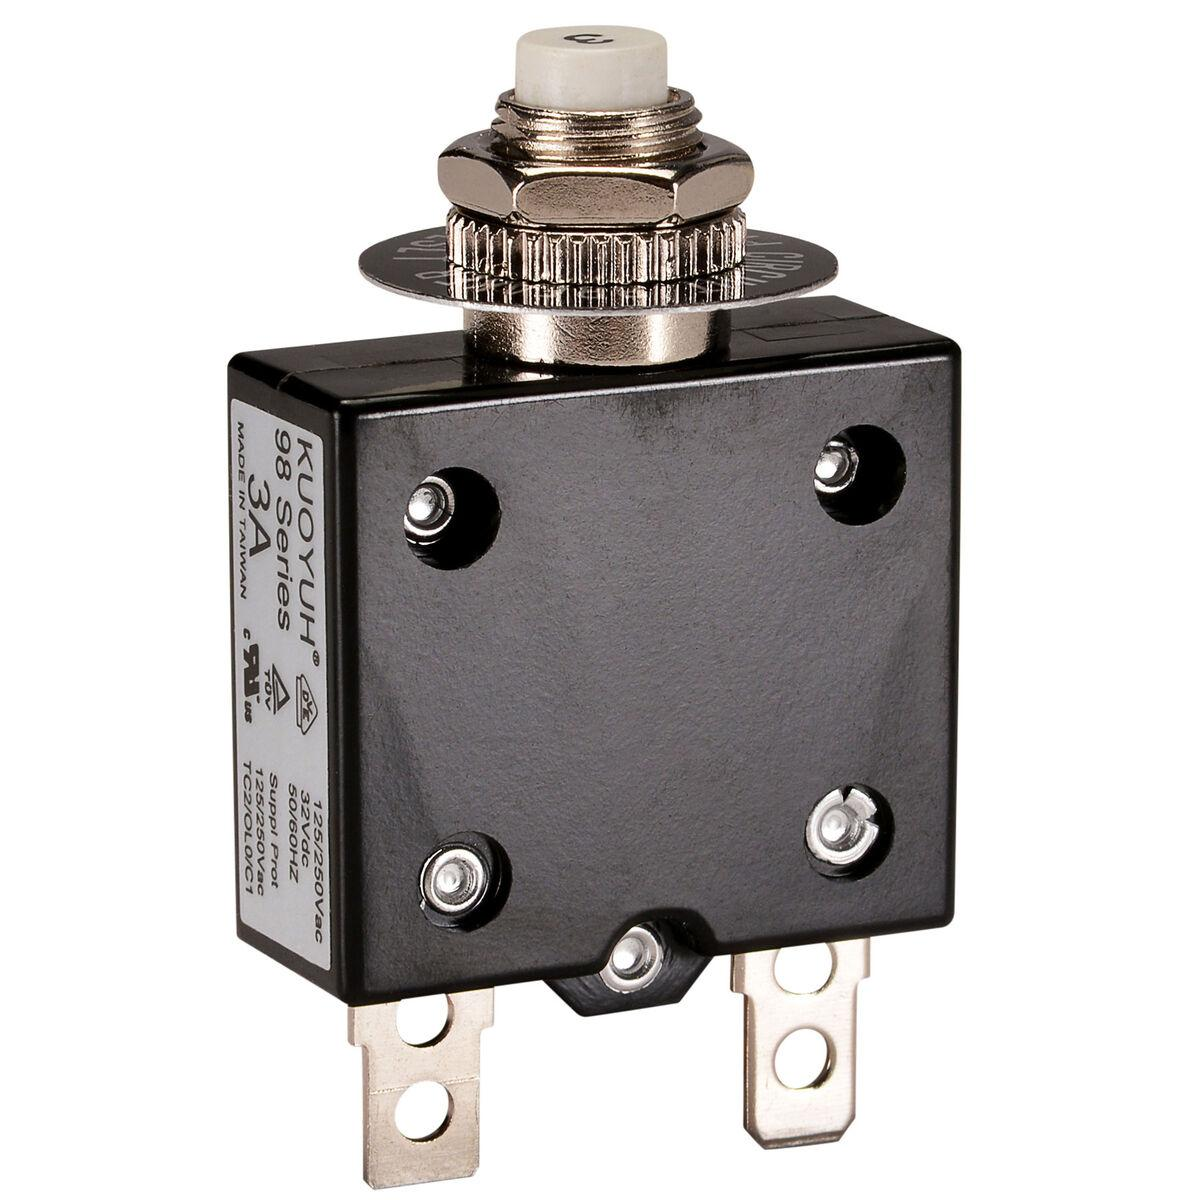 Resetable Circuit Breaker reset circuit breaker 8A pop up button